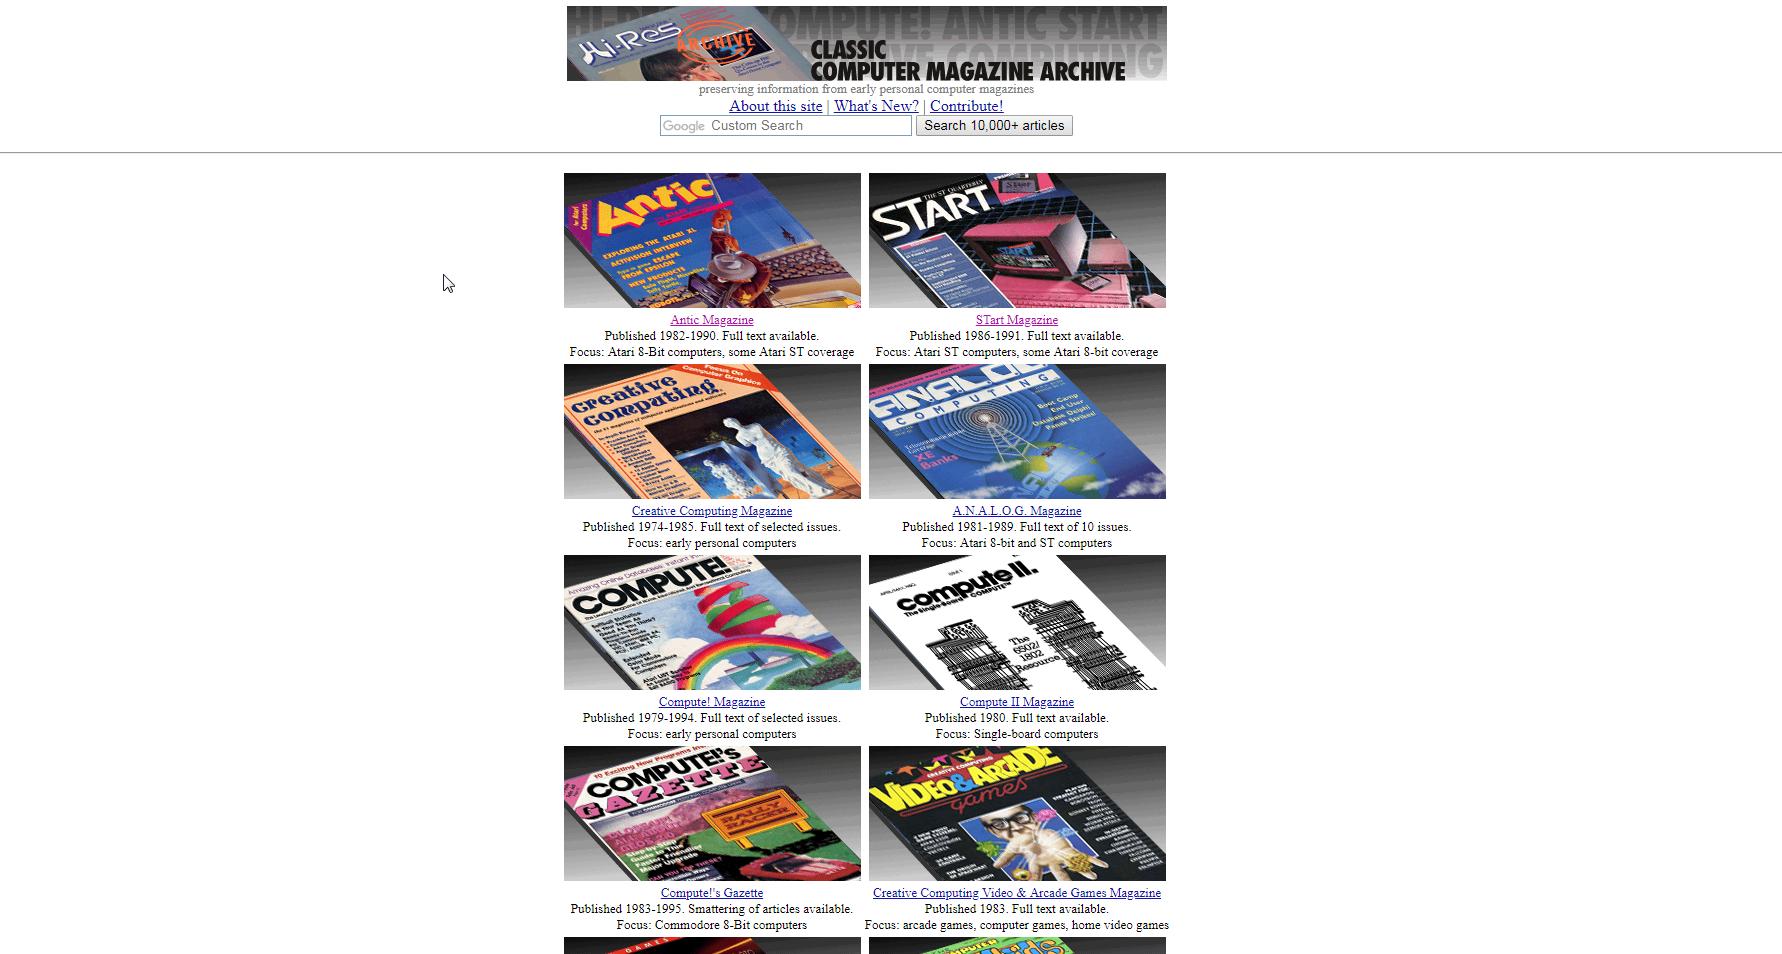 Screenshot of website Classic Computer Magazine Archive